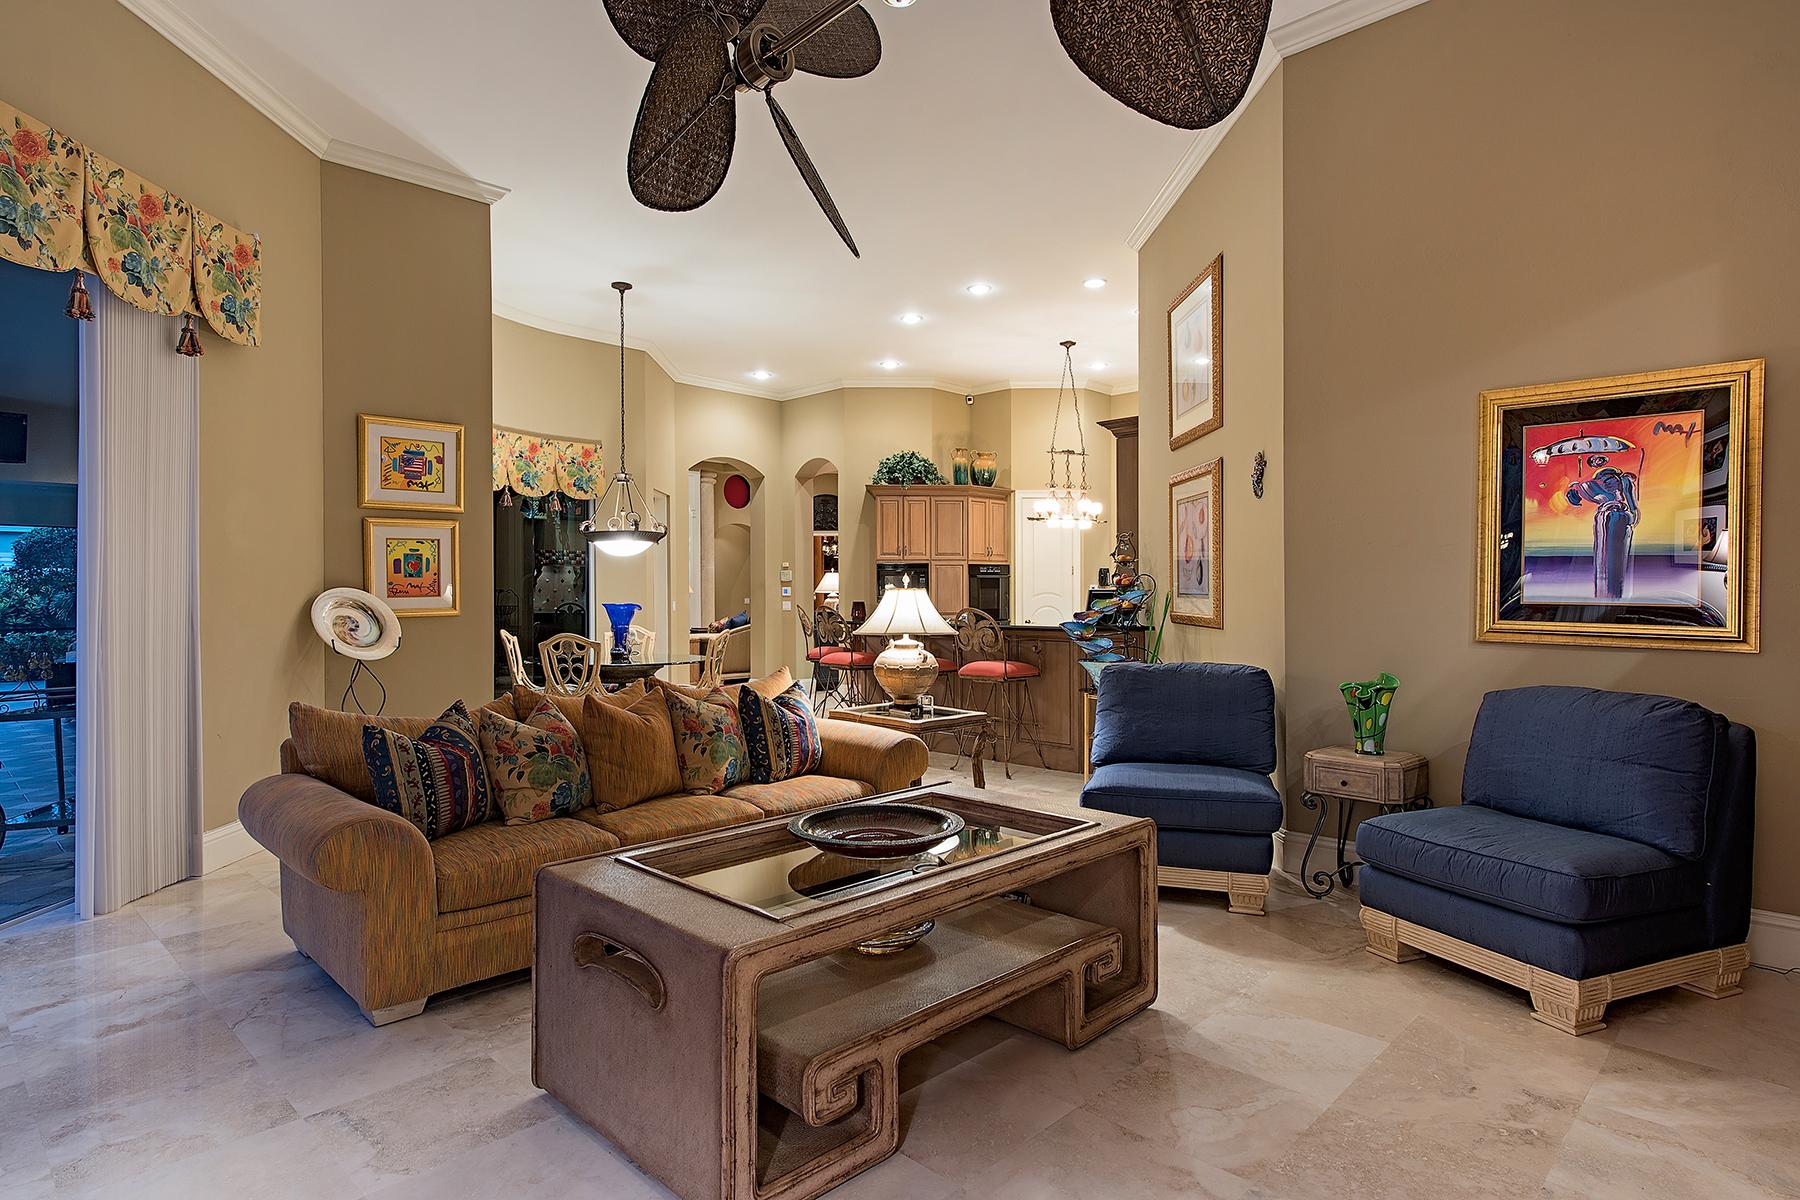 Additional photo for property listing at PELICAN MARSH - BAY LAUREL ESTATES 8707  Purslane Dr,  Naples, Florida 34109 United States